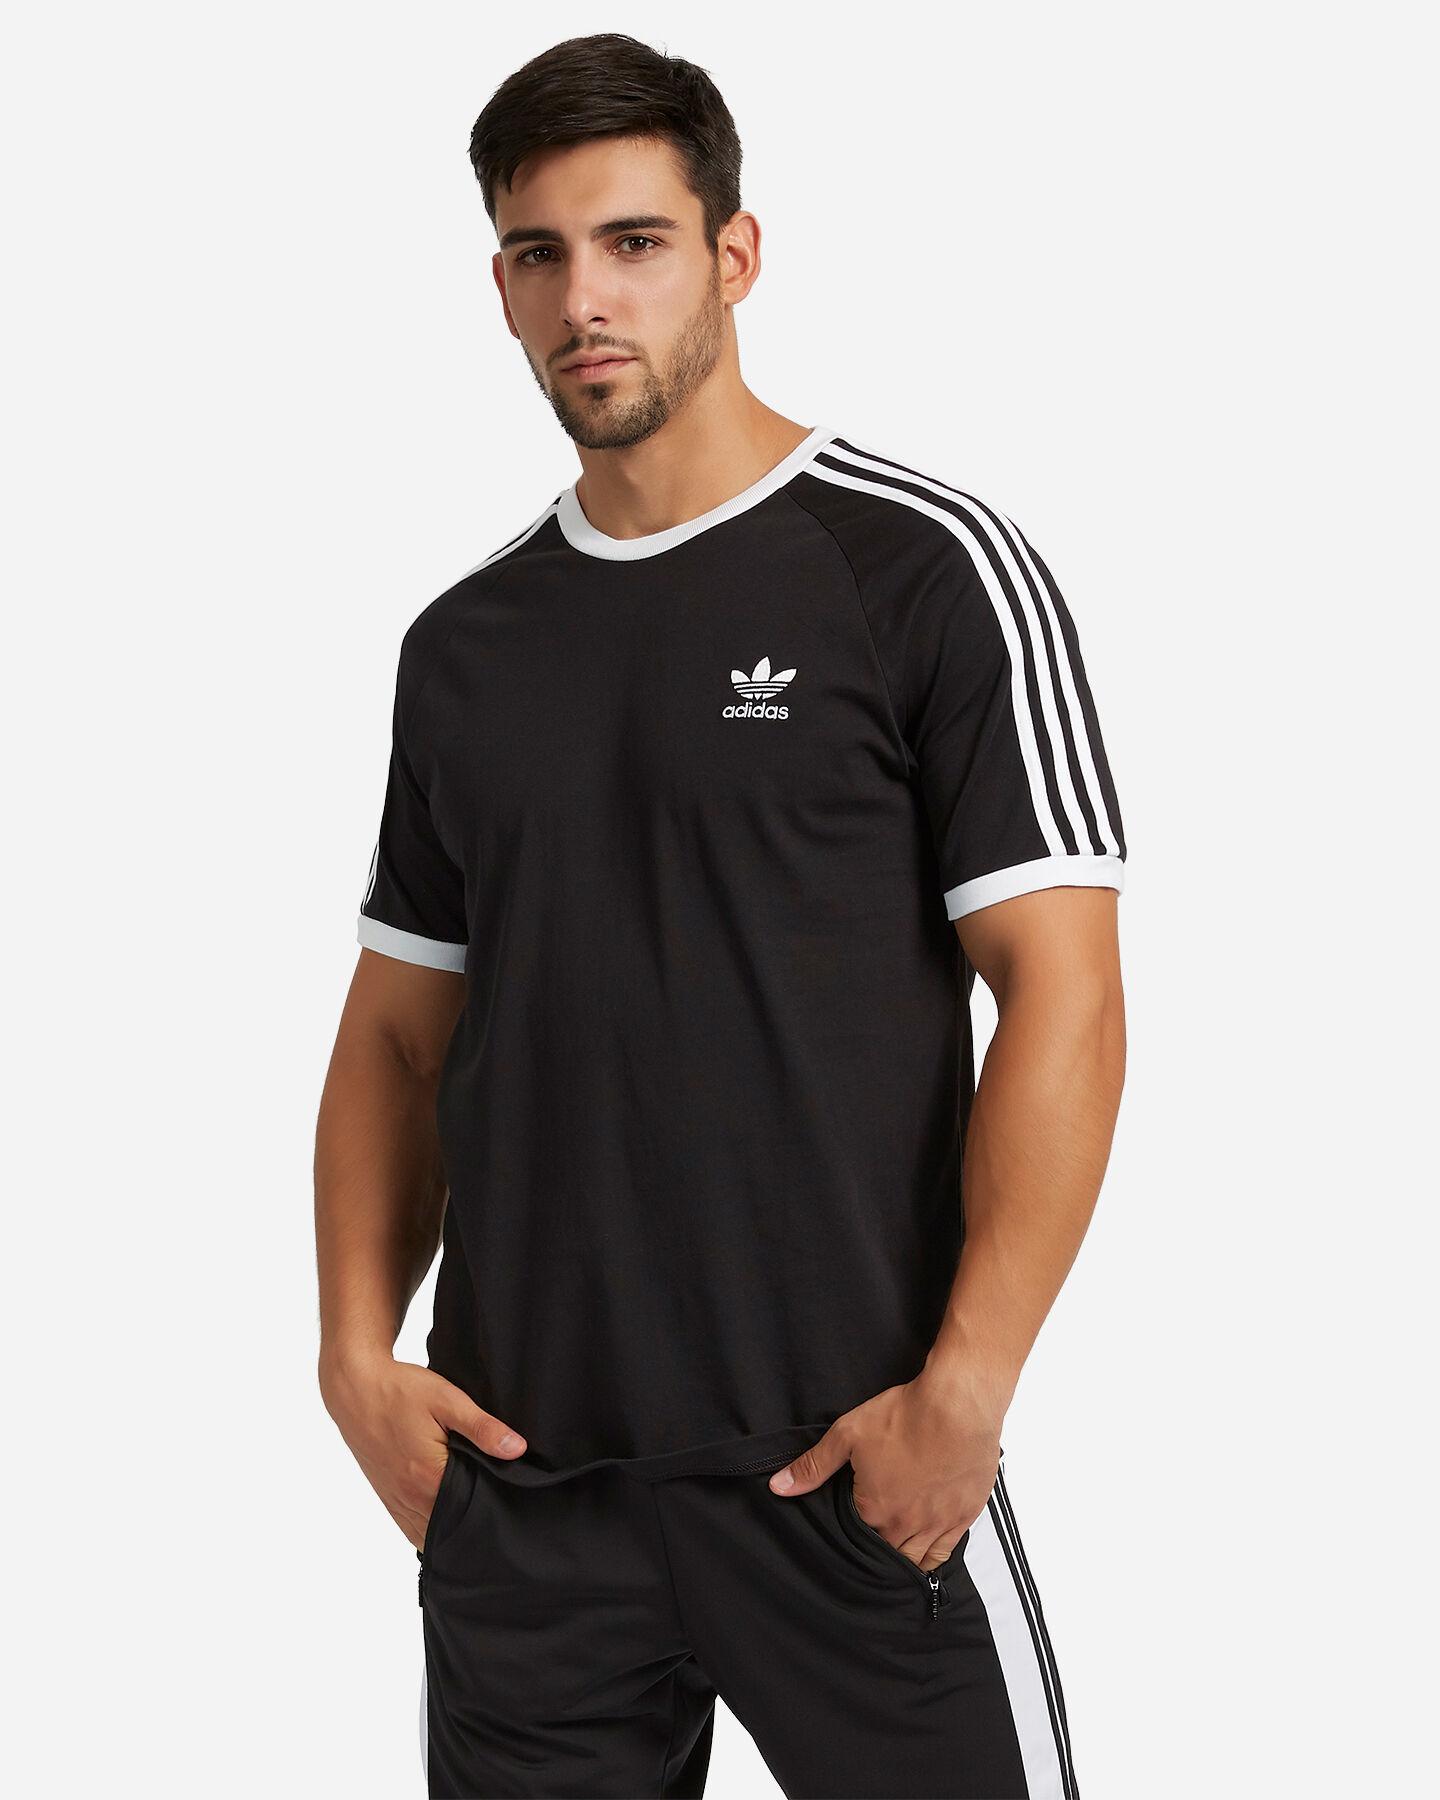 T-Shirt ADIDAS 3-STRIPES M S4043432 scatto 0